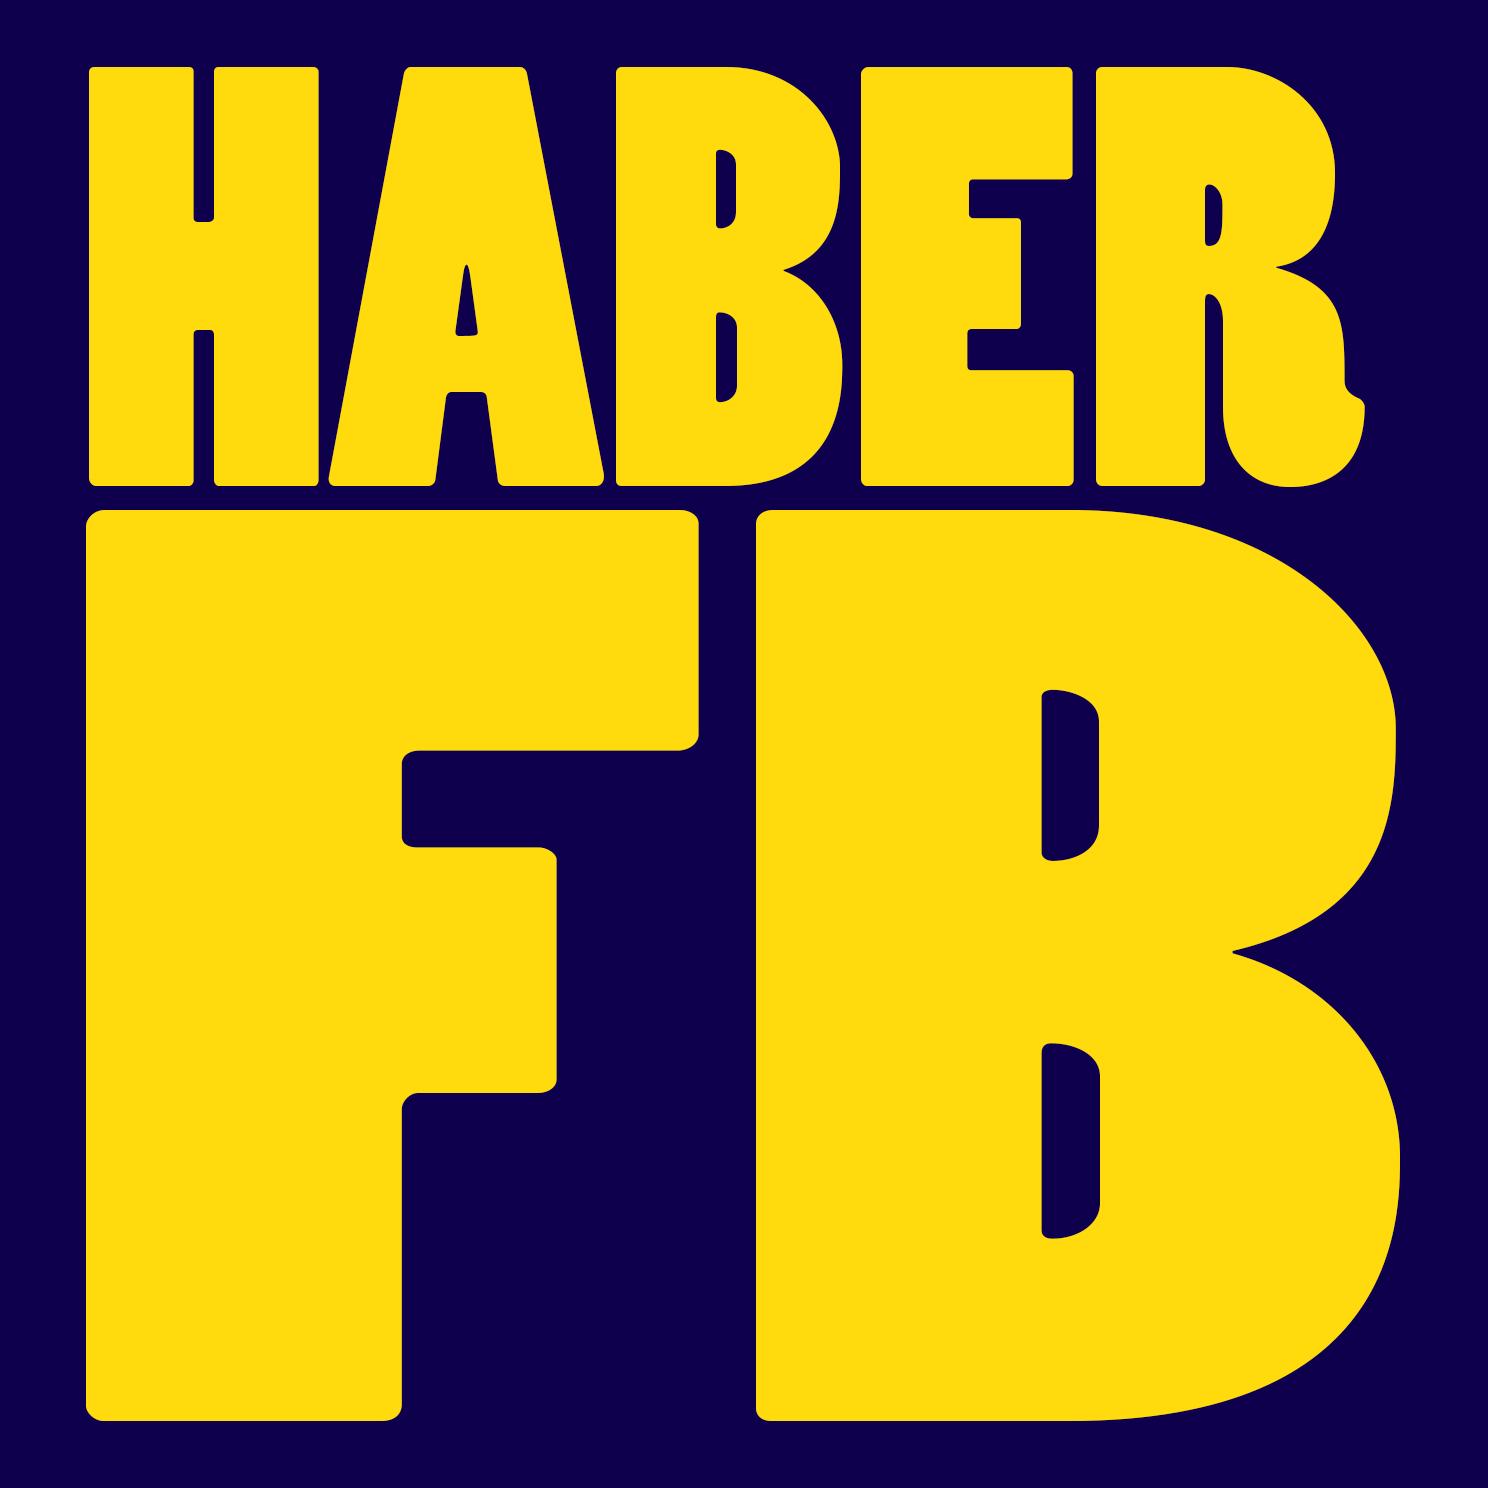 @haberfb